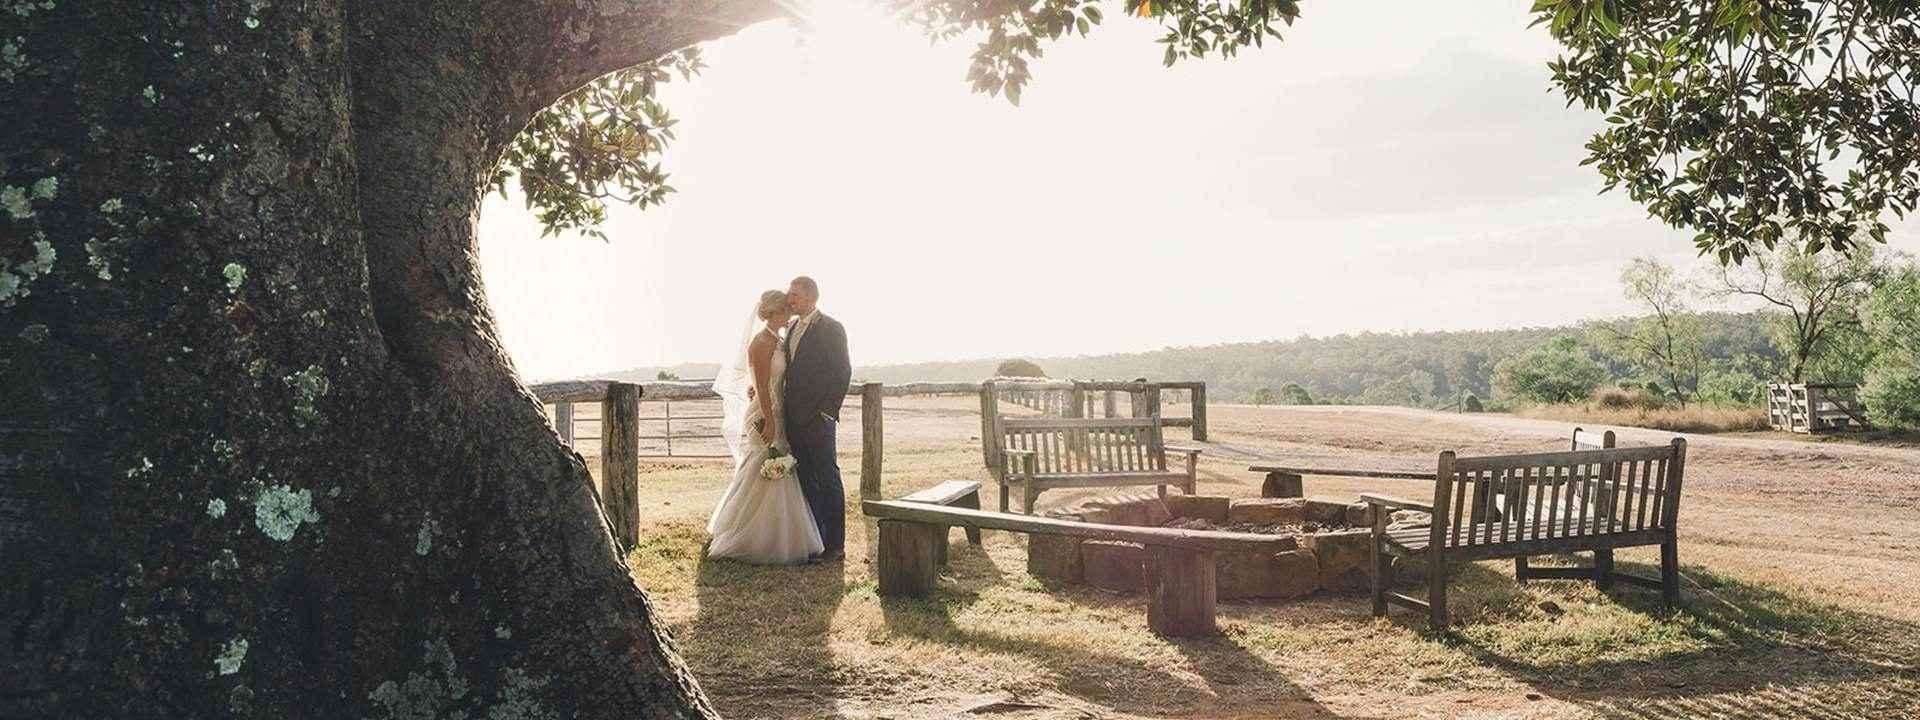 Wedding Venue - Spicers Hidden Vale 19 on Veilability